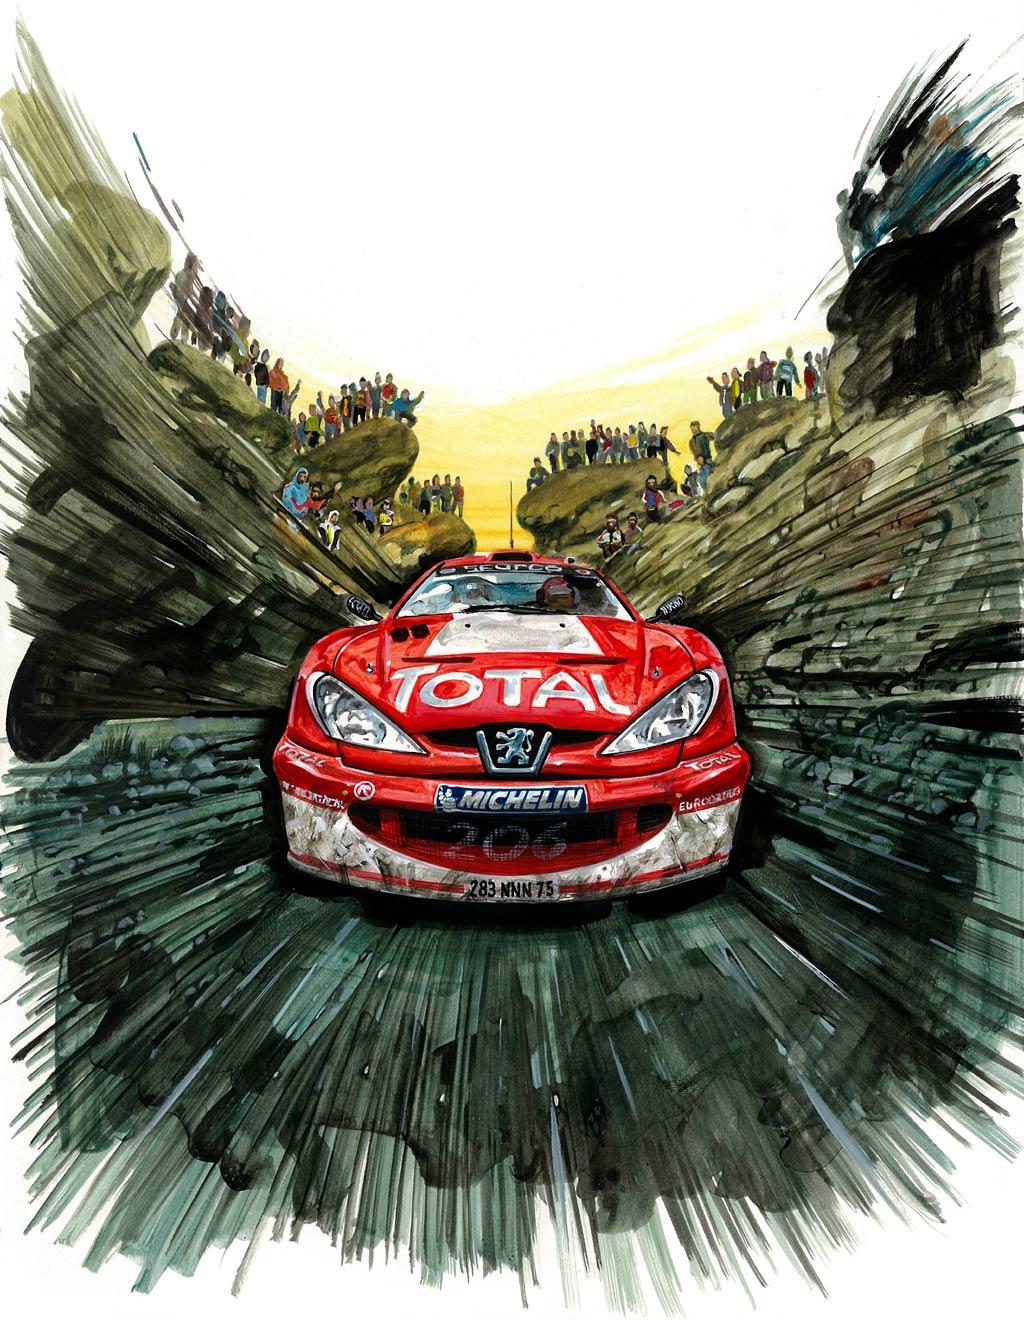 1000+ images about Peugeot 206 WRC on Pinterest